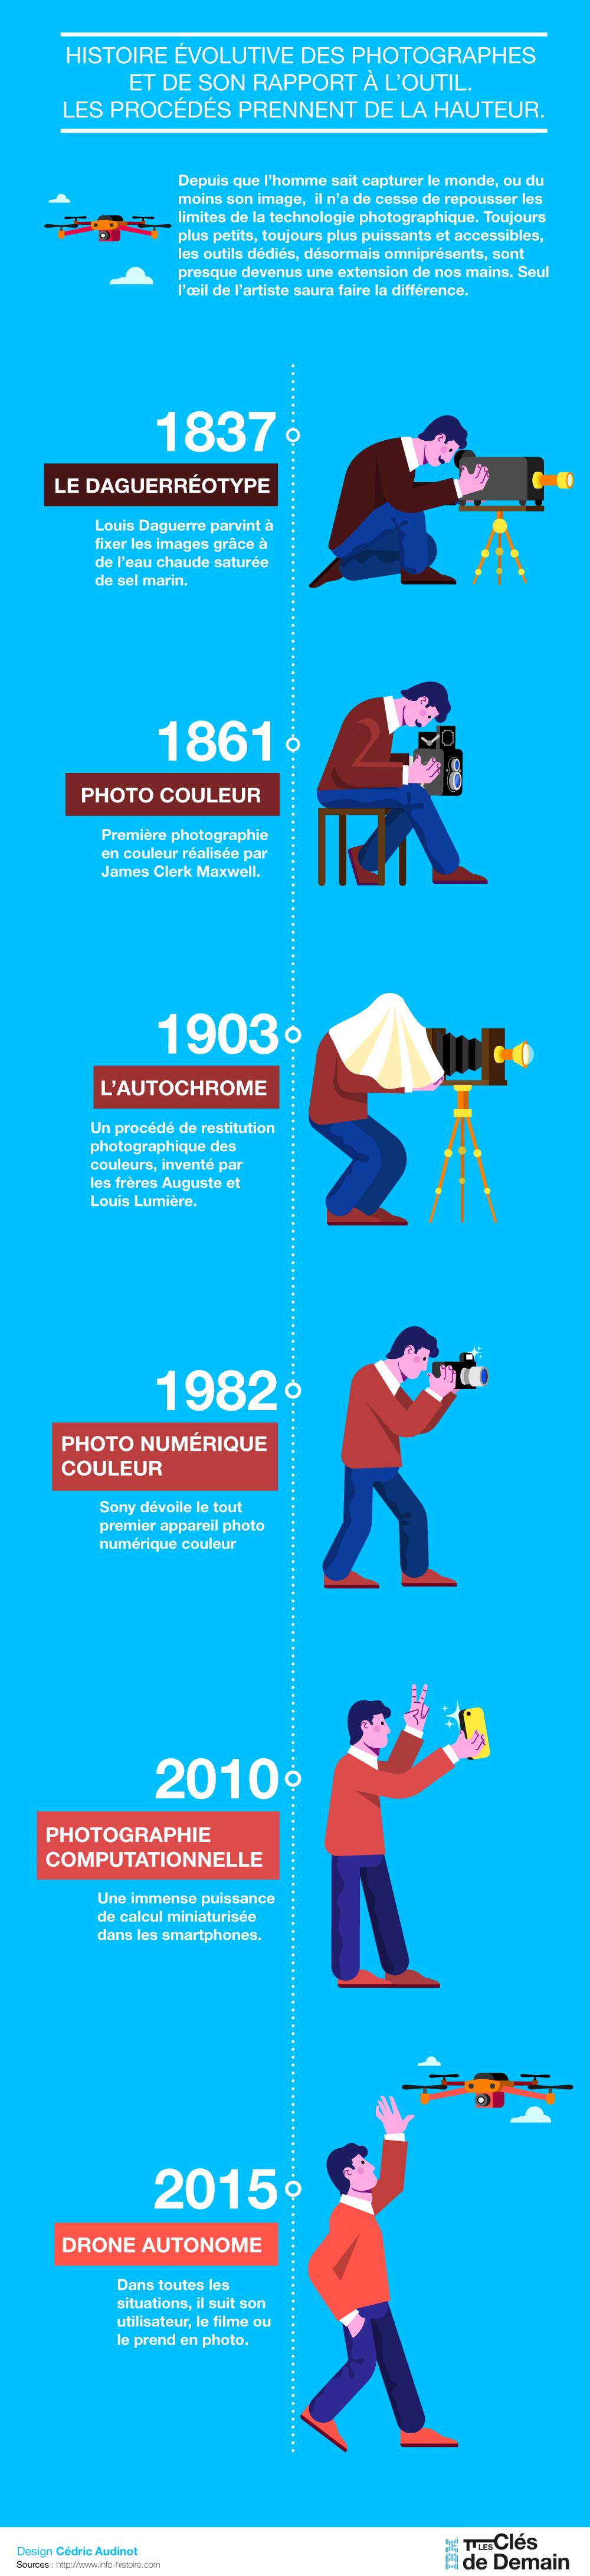 infographie_by_Cedric-Audinot_IBM_photo-numerique-etapes